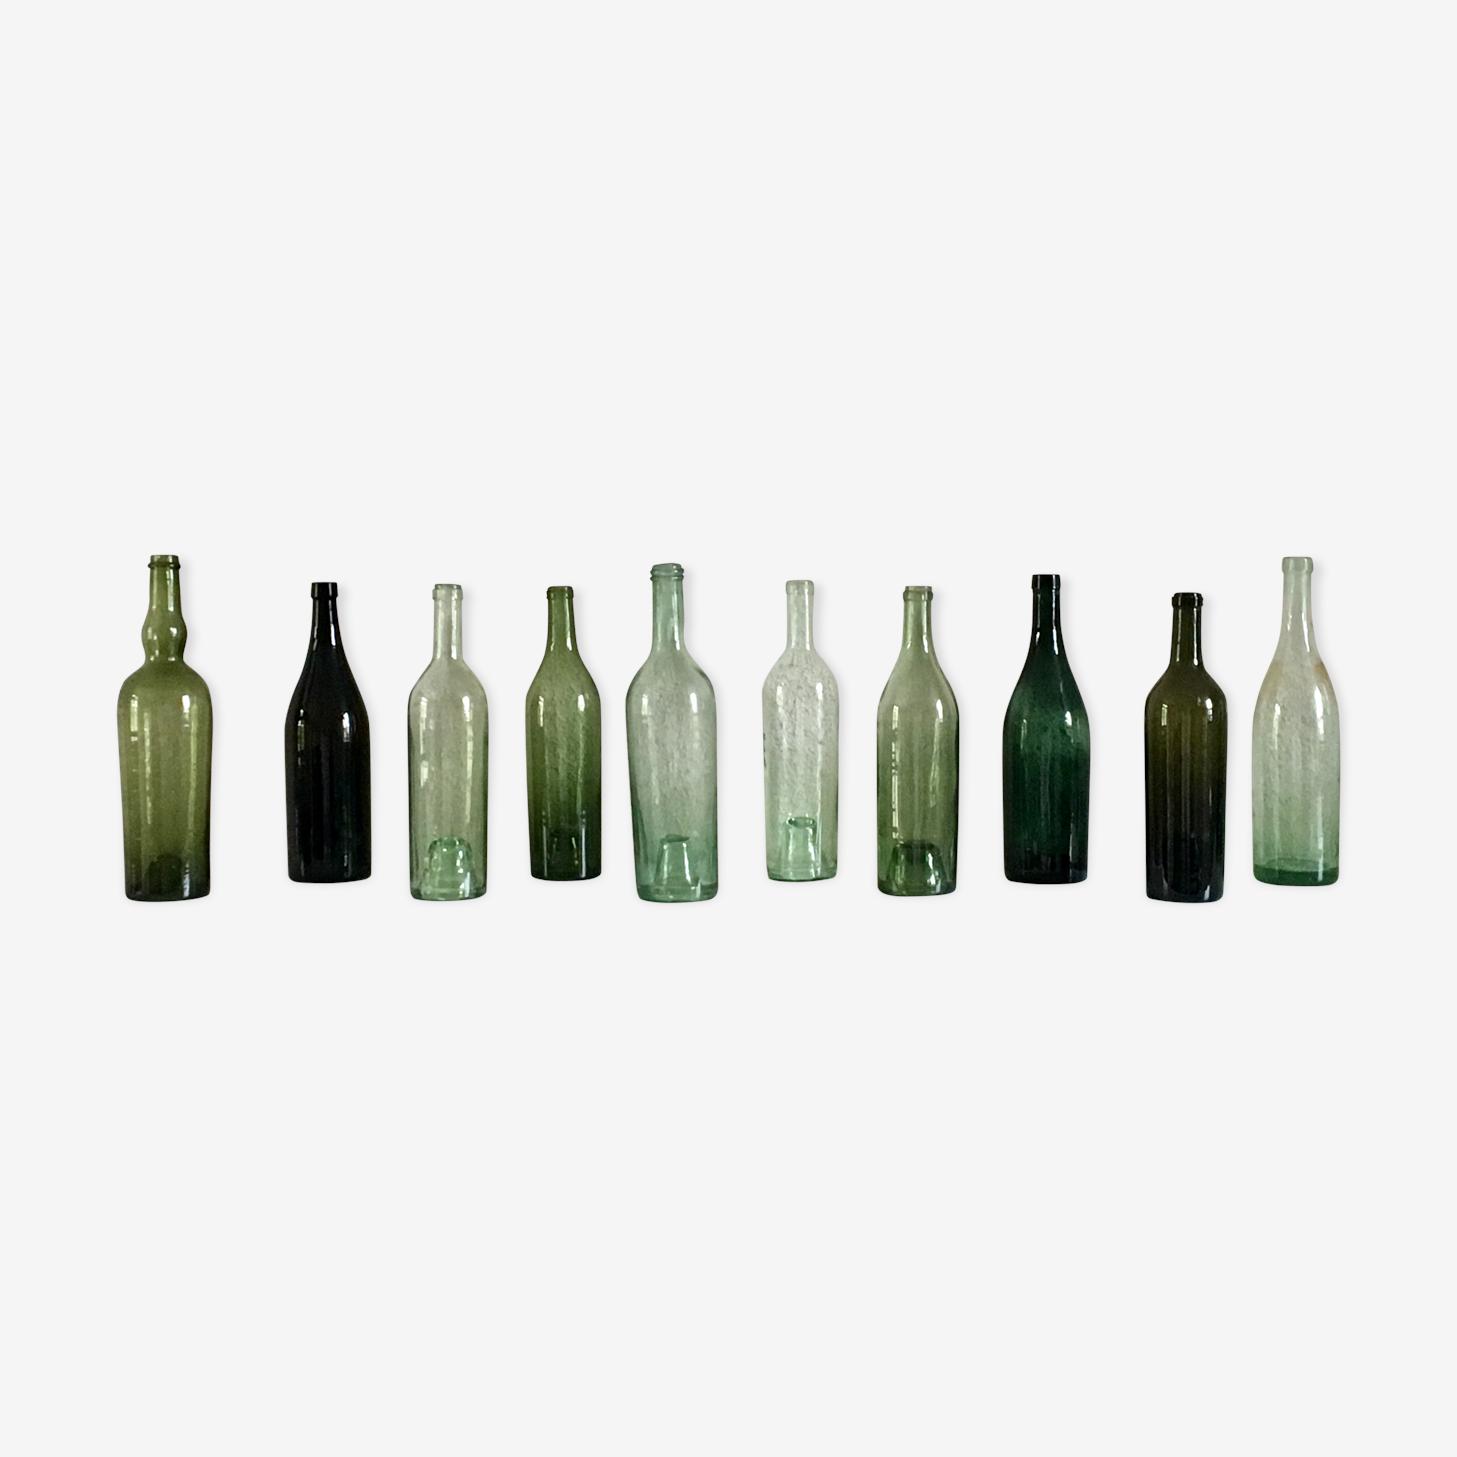 Series of ten old bottles